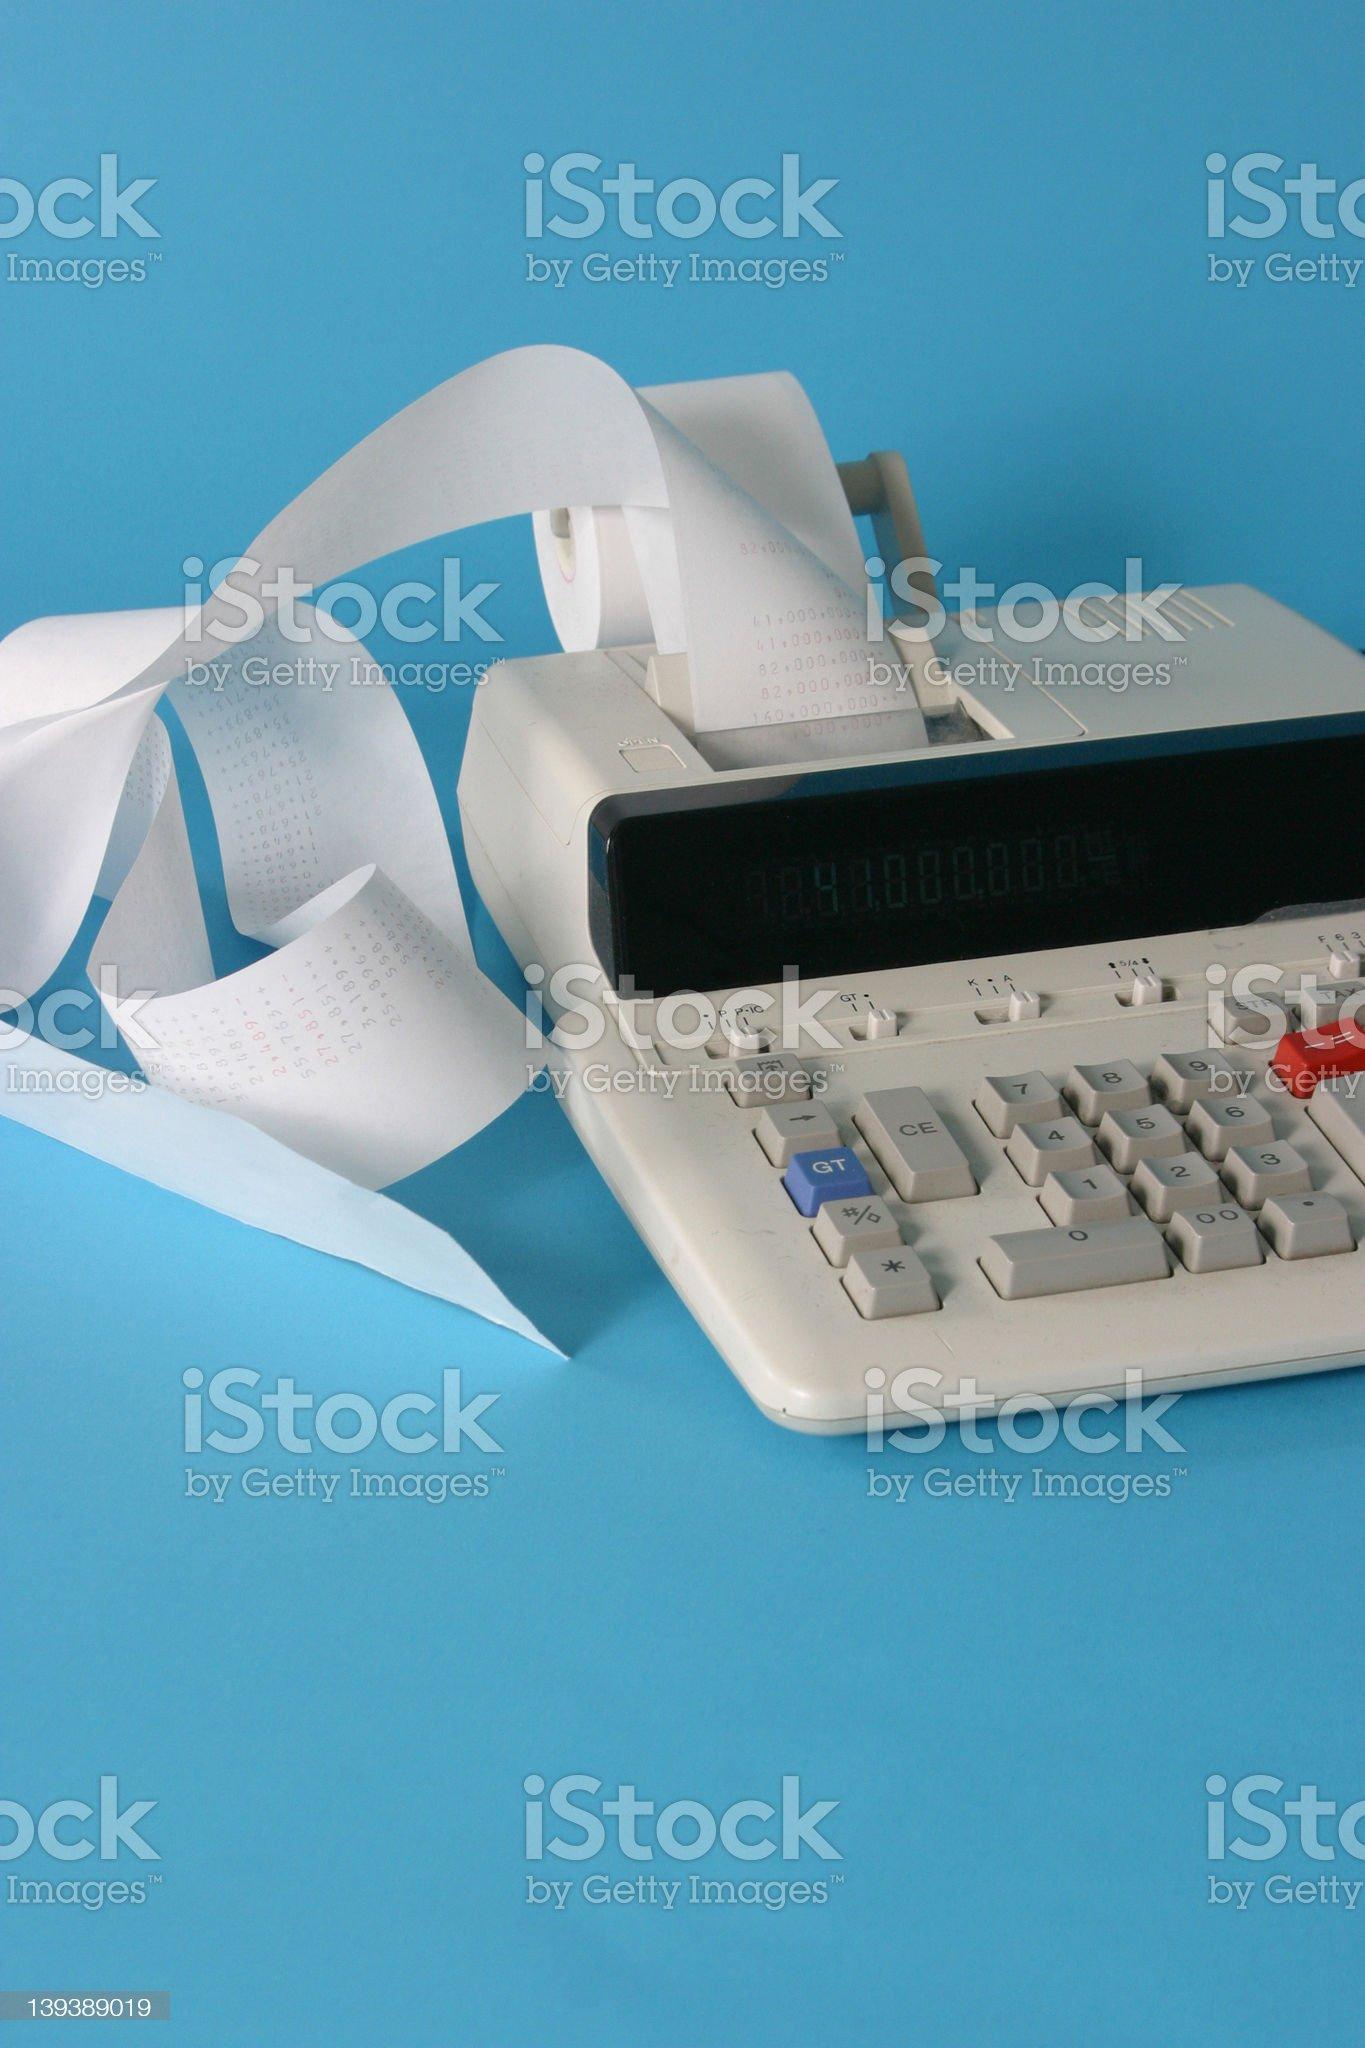 Adding Machine royalty-free stock photo